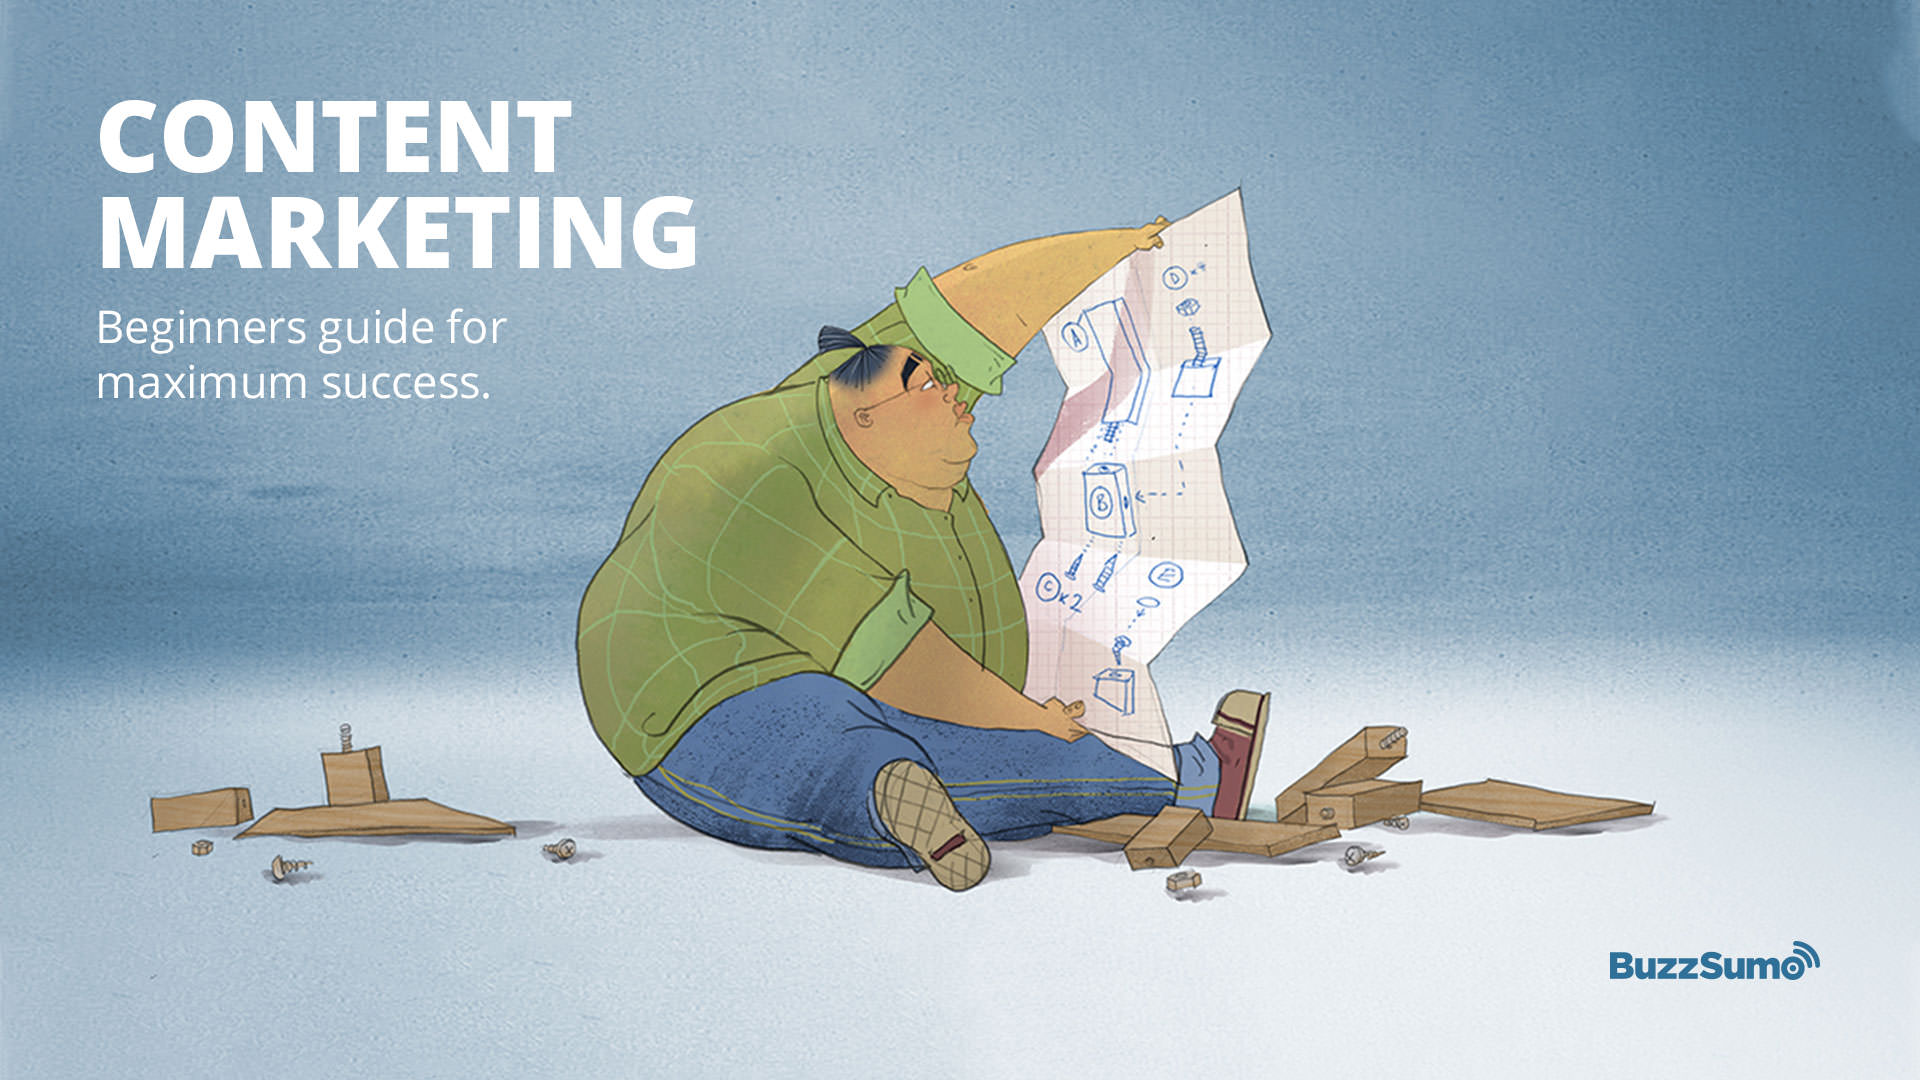 Content Marketing Beginners Guide for Maximum Success